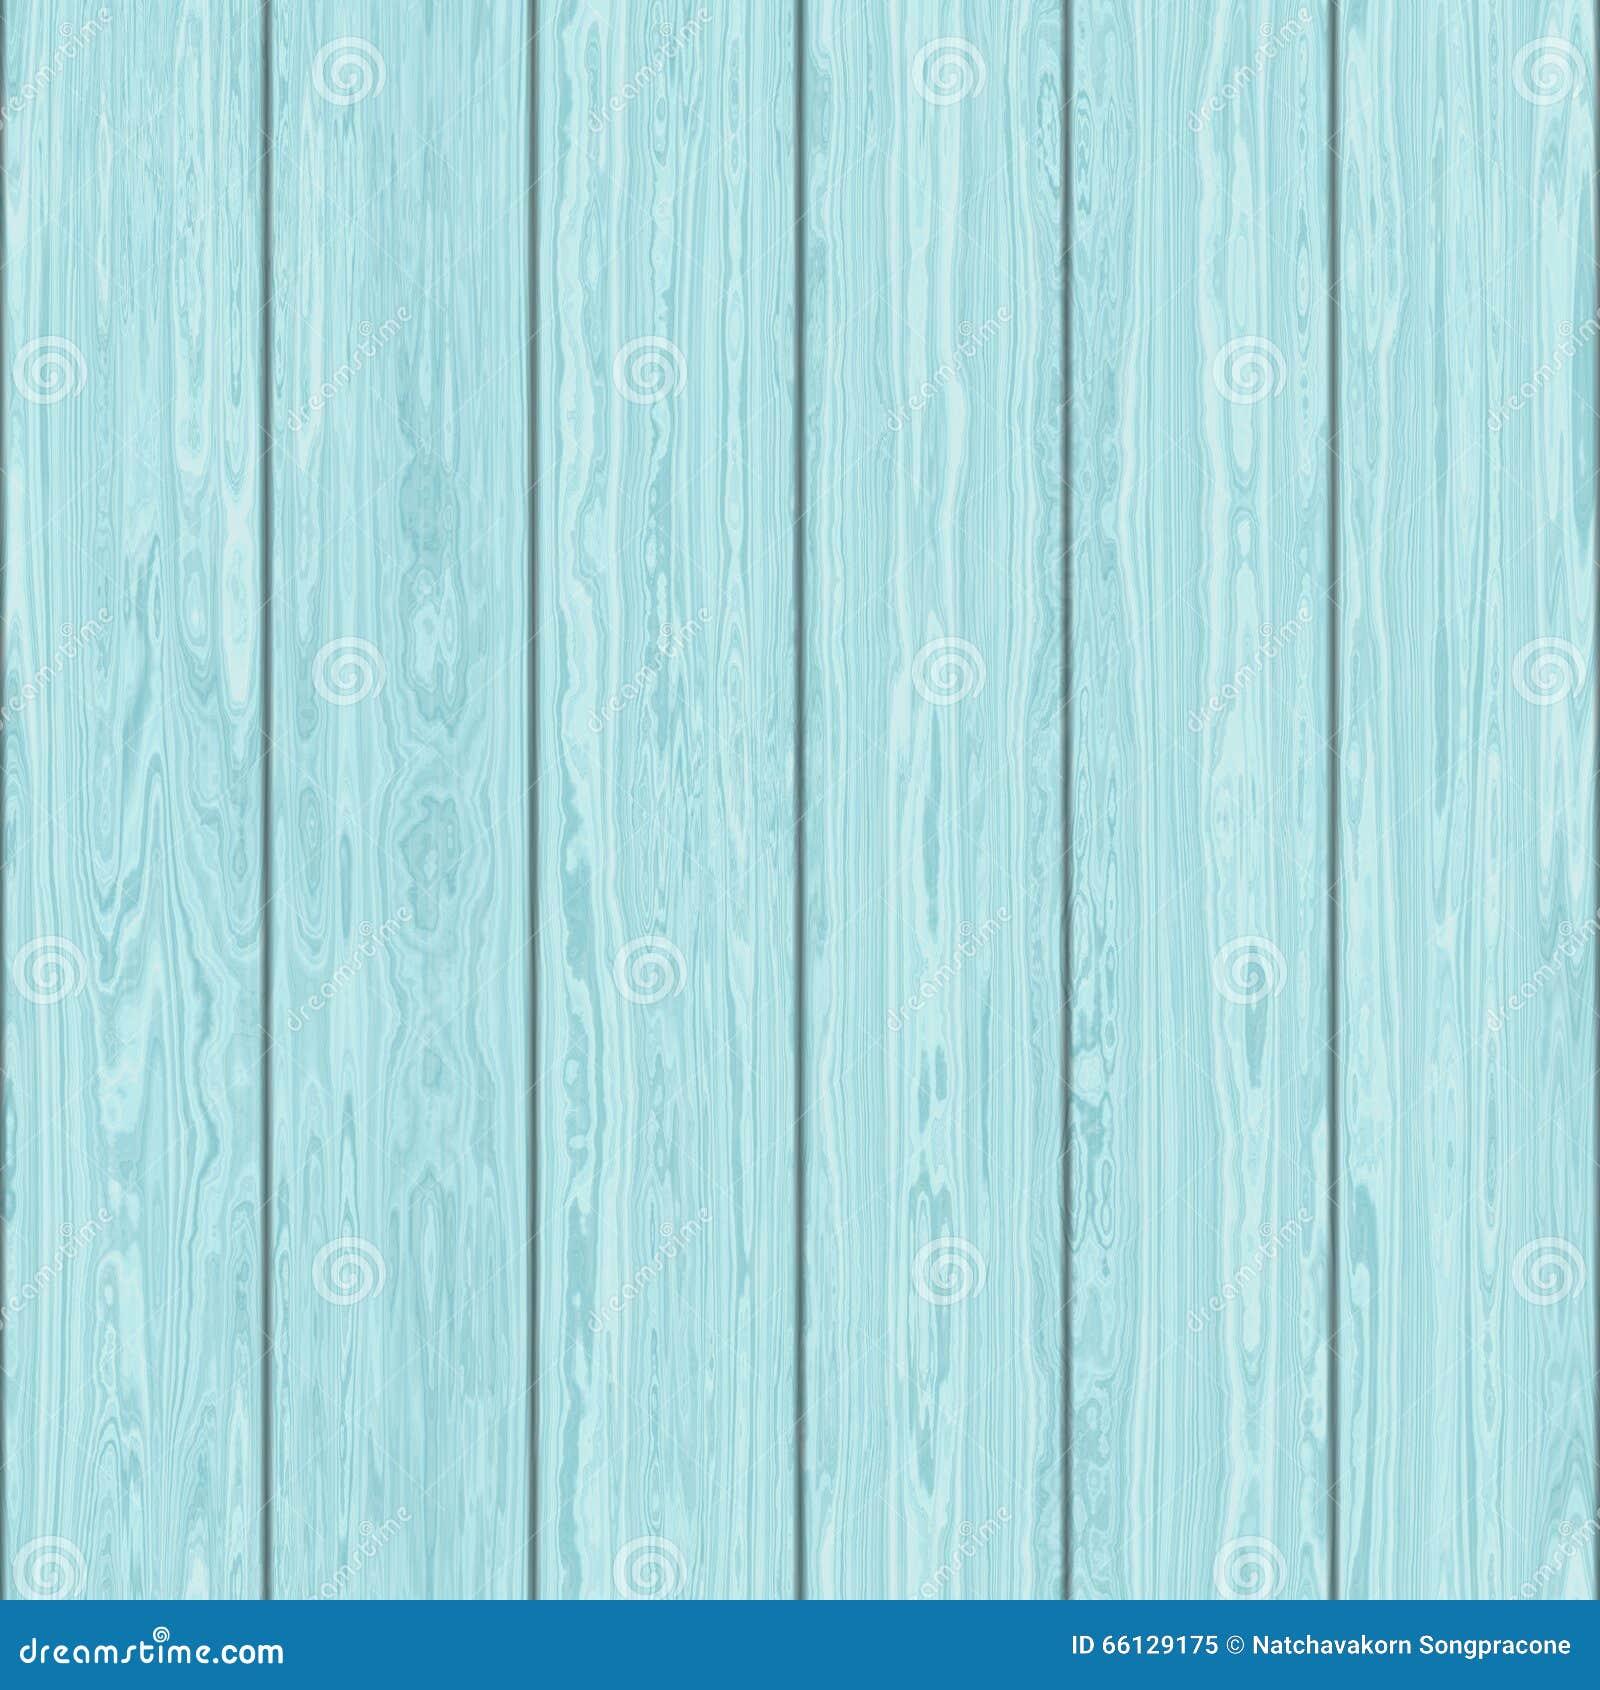 Seamless Wood Pallet Texture Illustration Stock Image ...